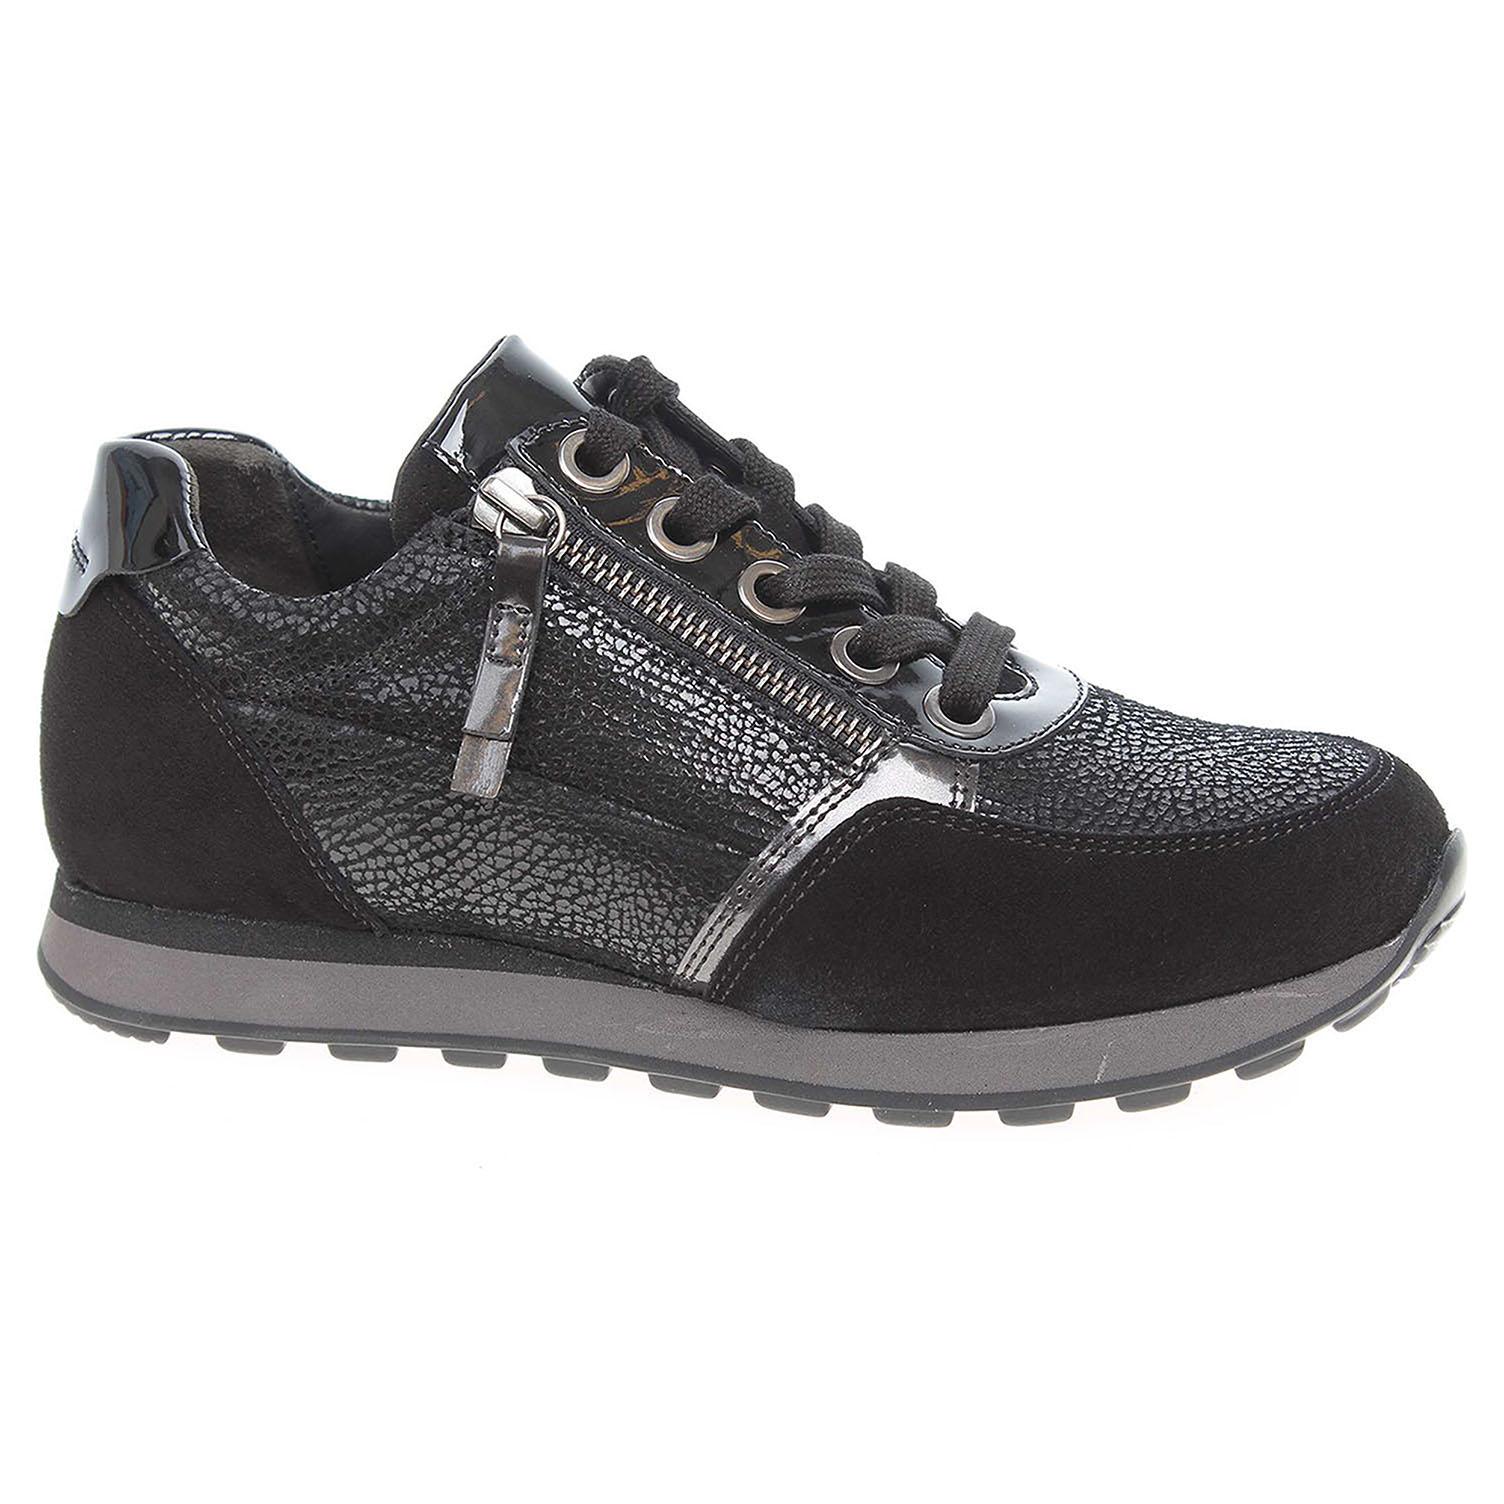 Dámská obuv Gabor 76.335.97 černá 76.335.97 41